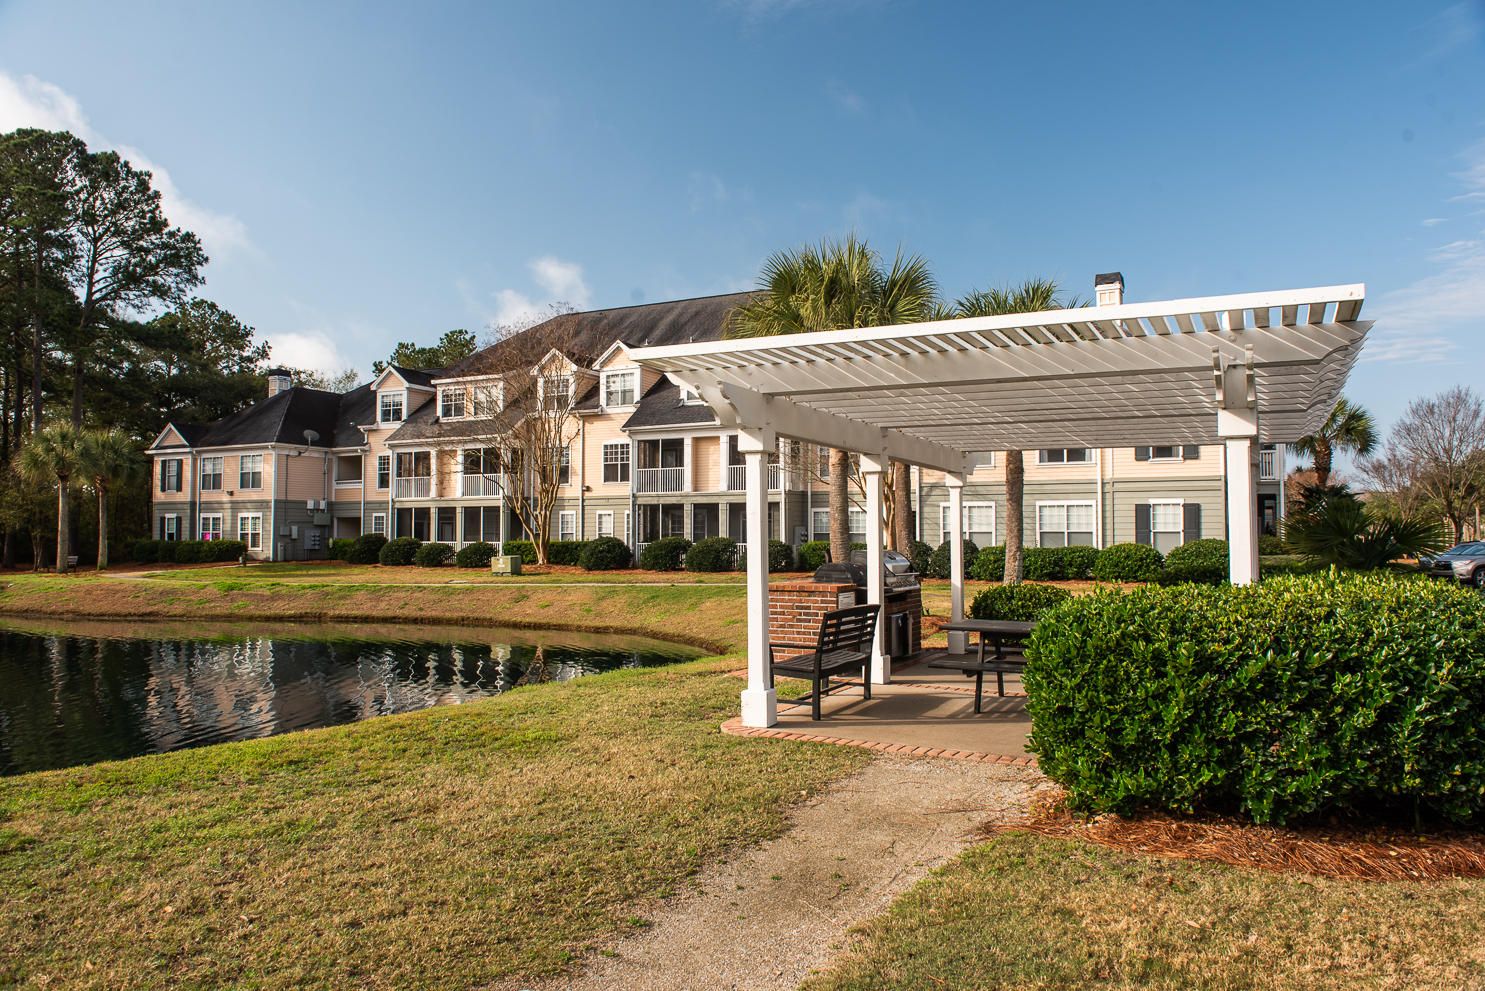 Daniel Landing Condos Homes For Sale - 130 River Landing, Charleston, SC - 5